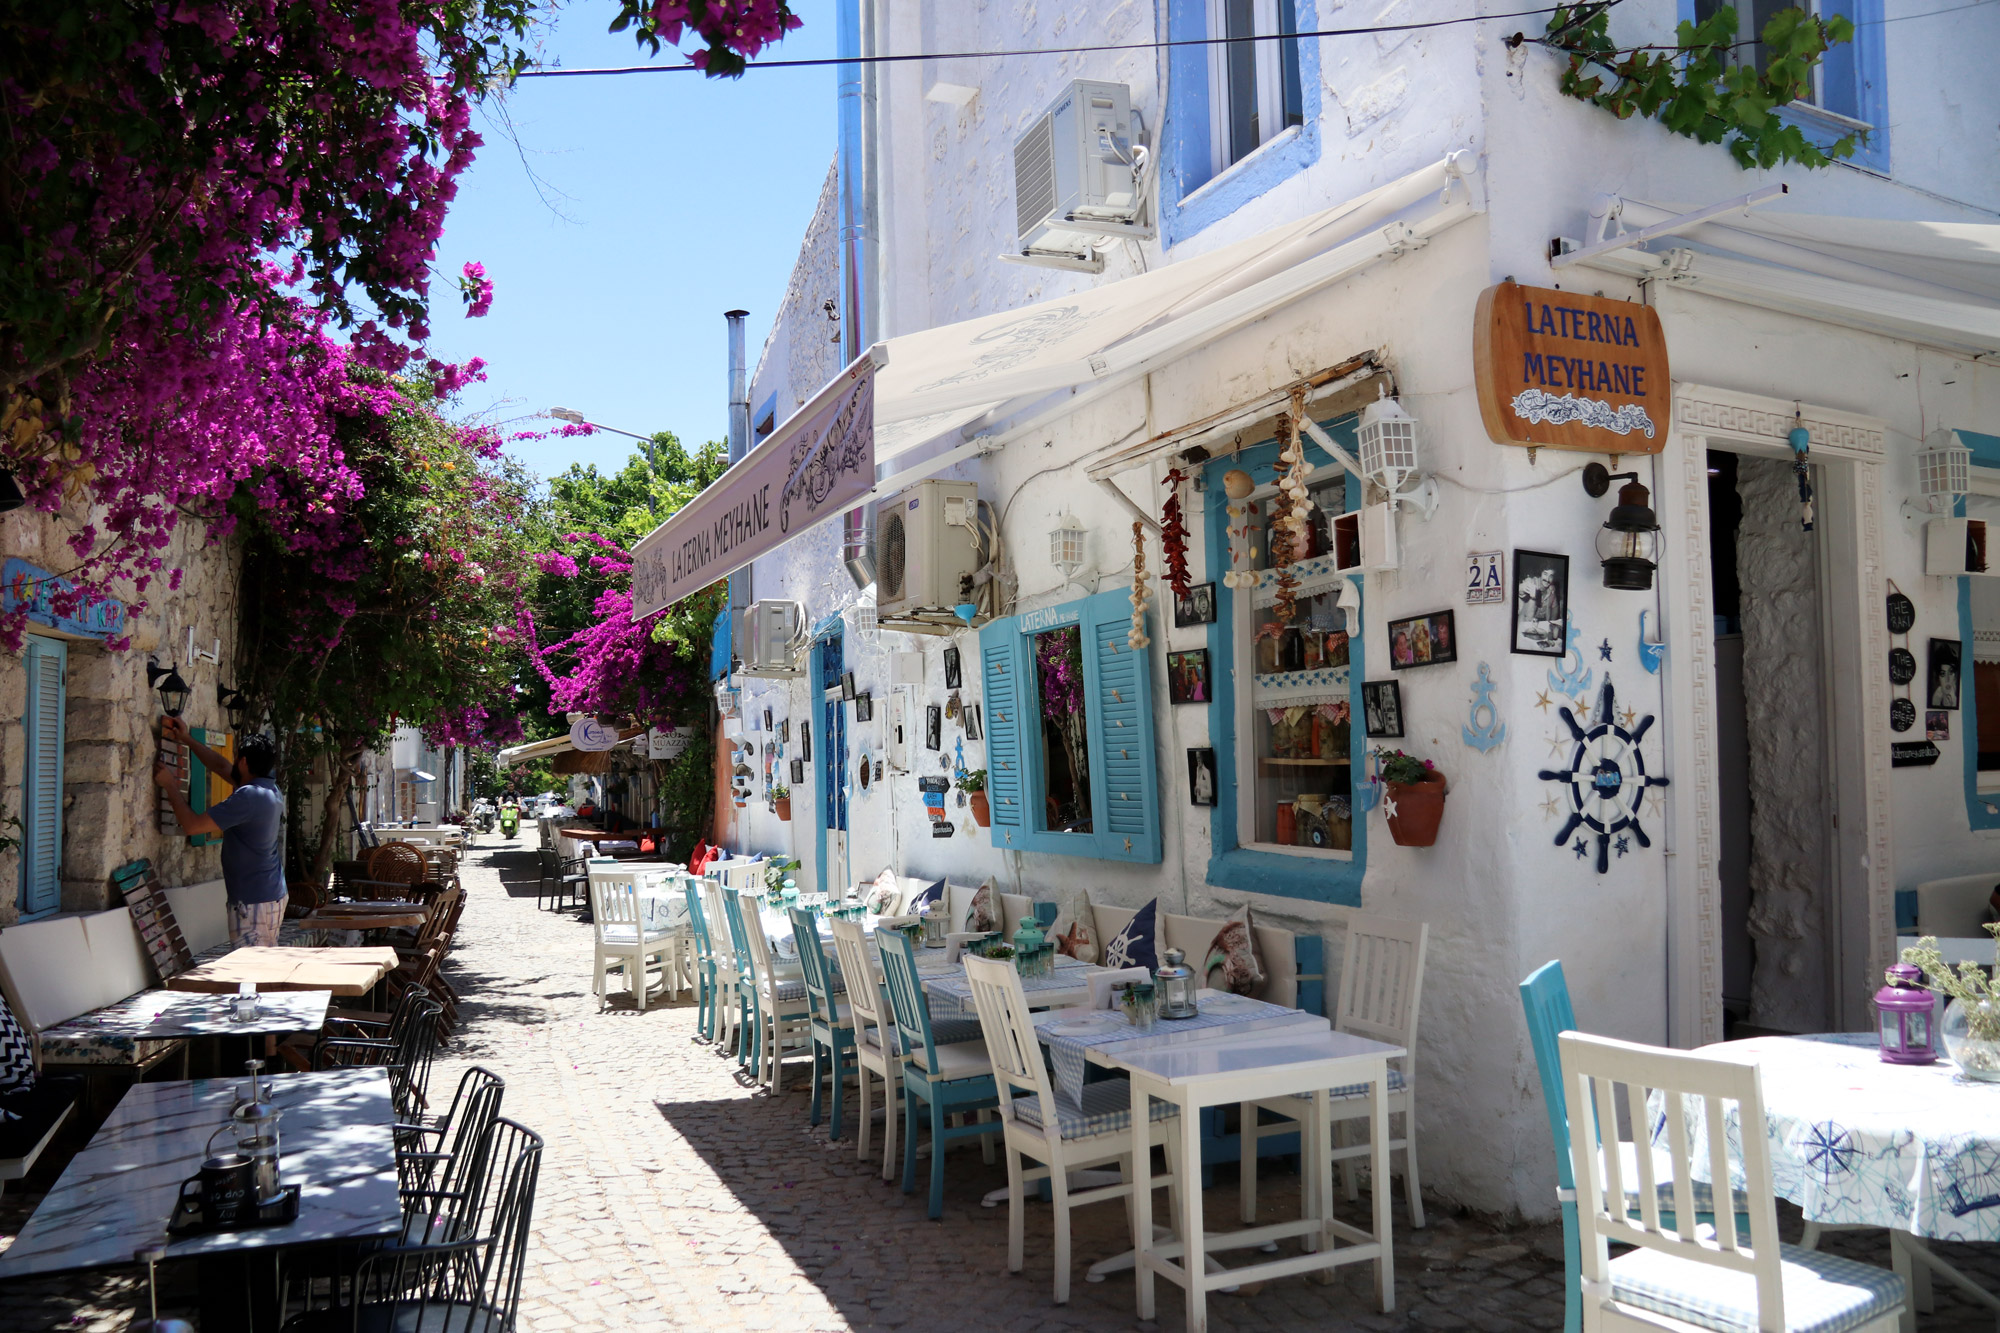 turkije reisverslag laatste dag in alacat